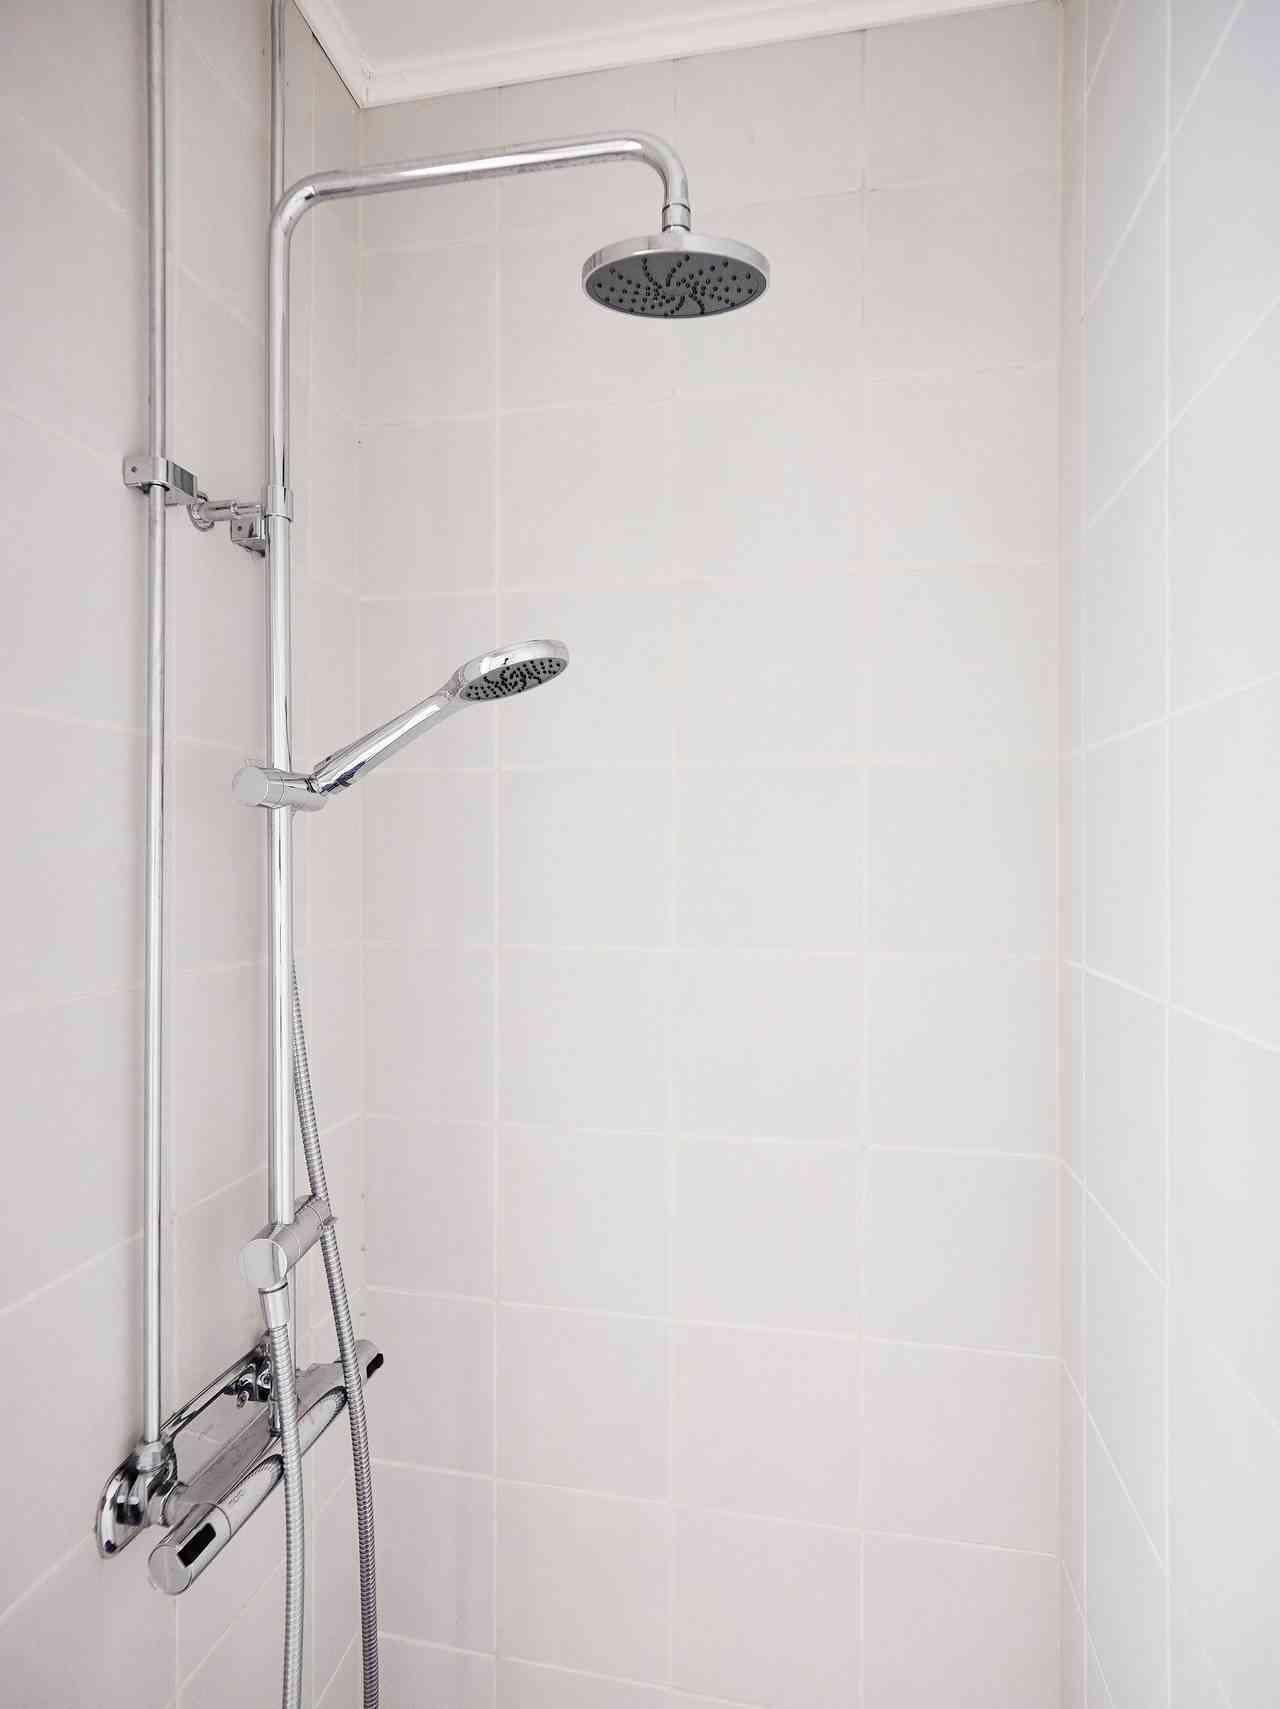 apartamento 32 metros - ducha